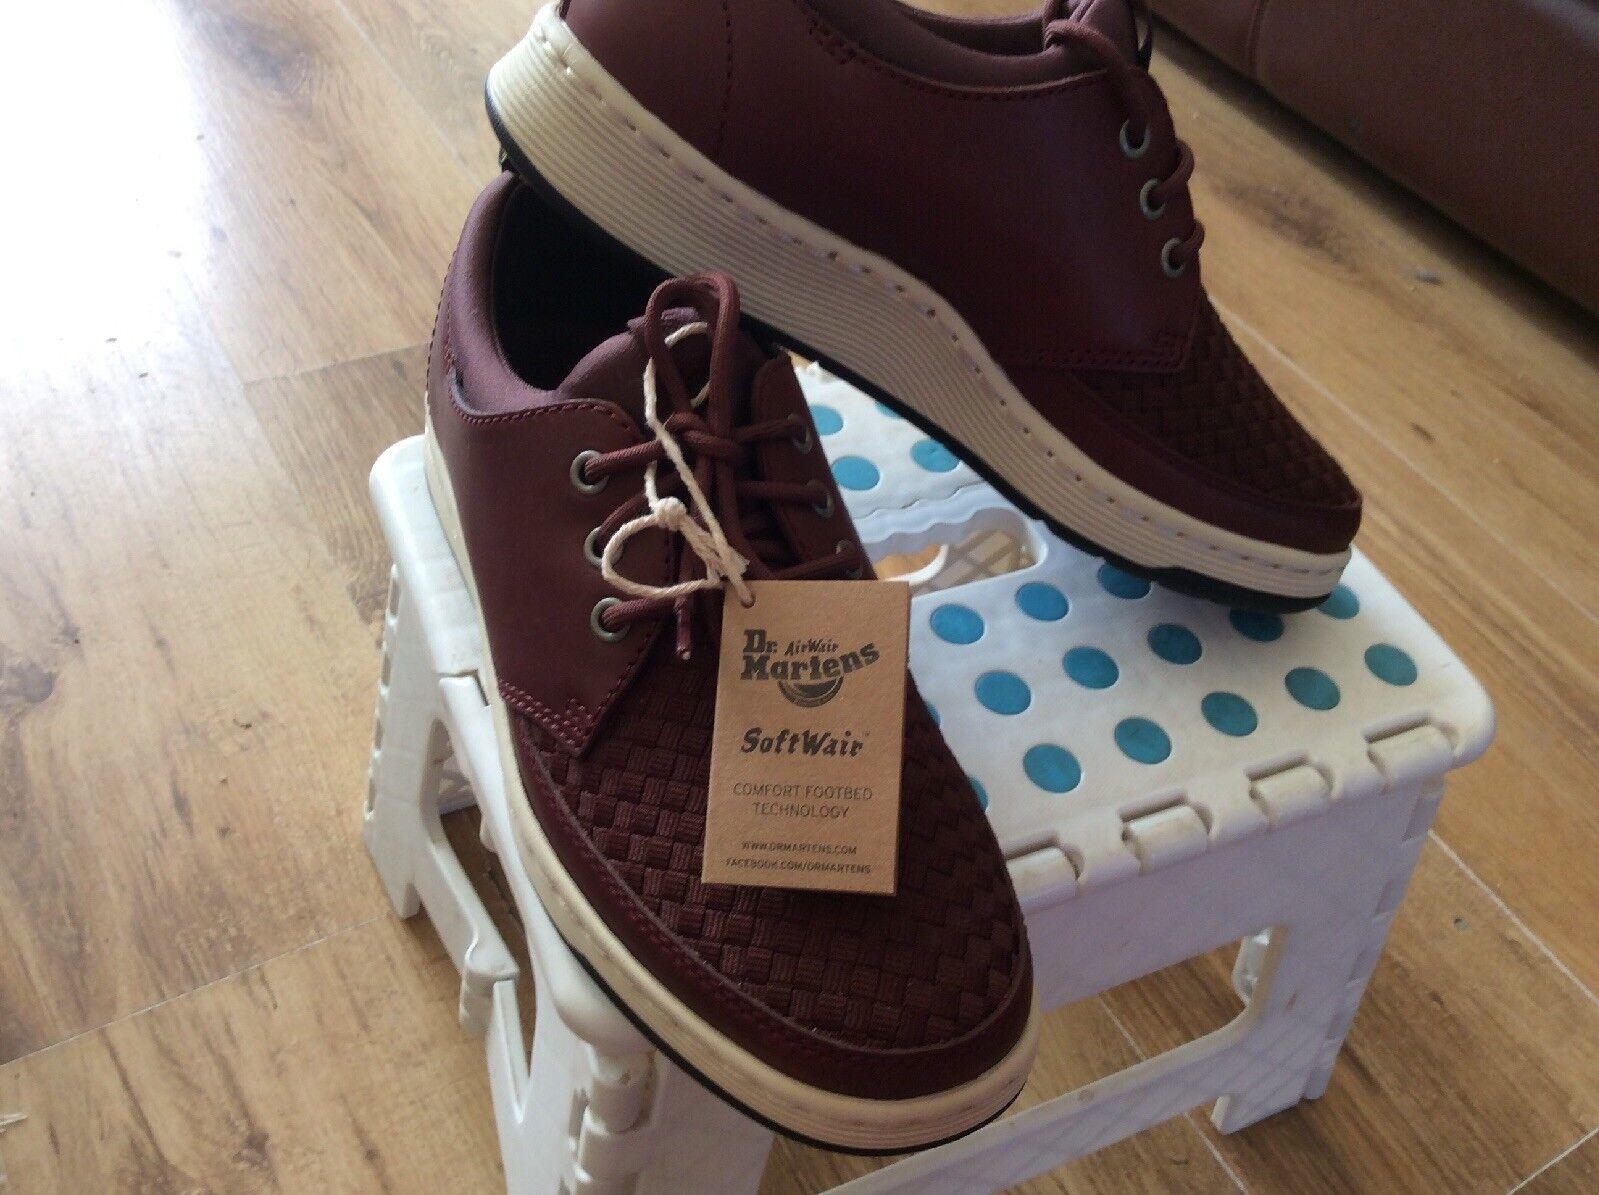 vendite online LADIES DR MARTENS SOFT SOFT SOFT WAIR UK6 BURGUNDY LACE UP BNWT WALKING LIGHTWEIGHT scarpe  autentico online